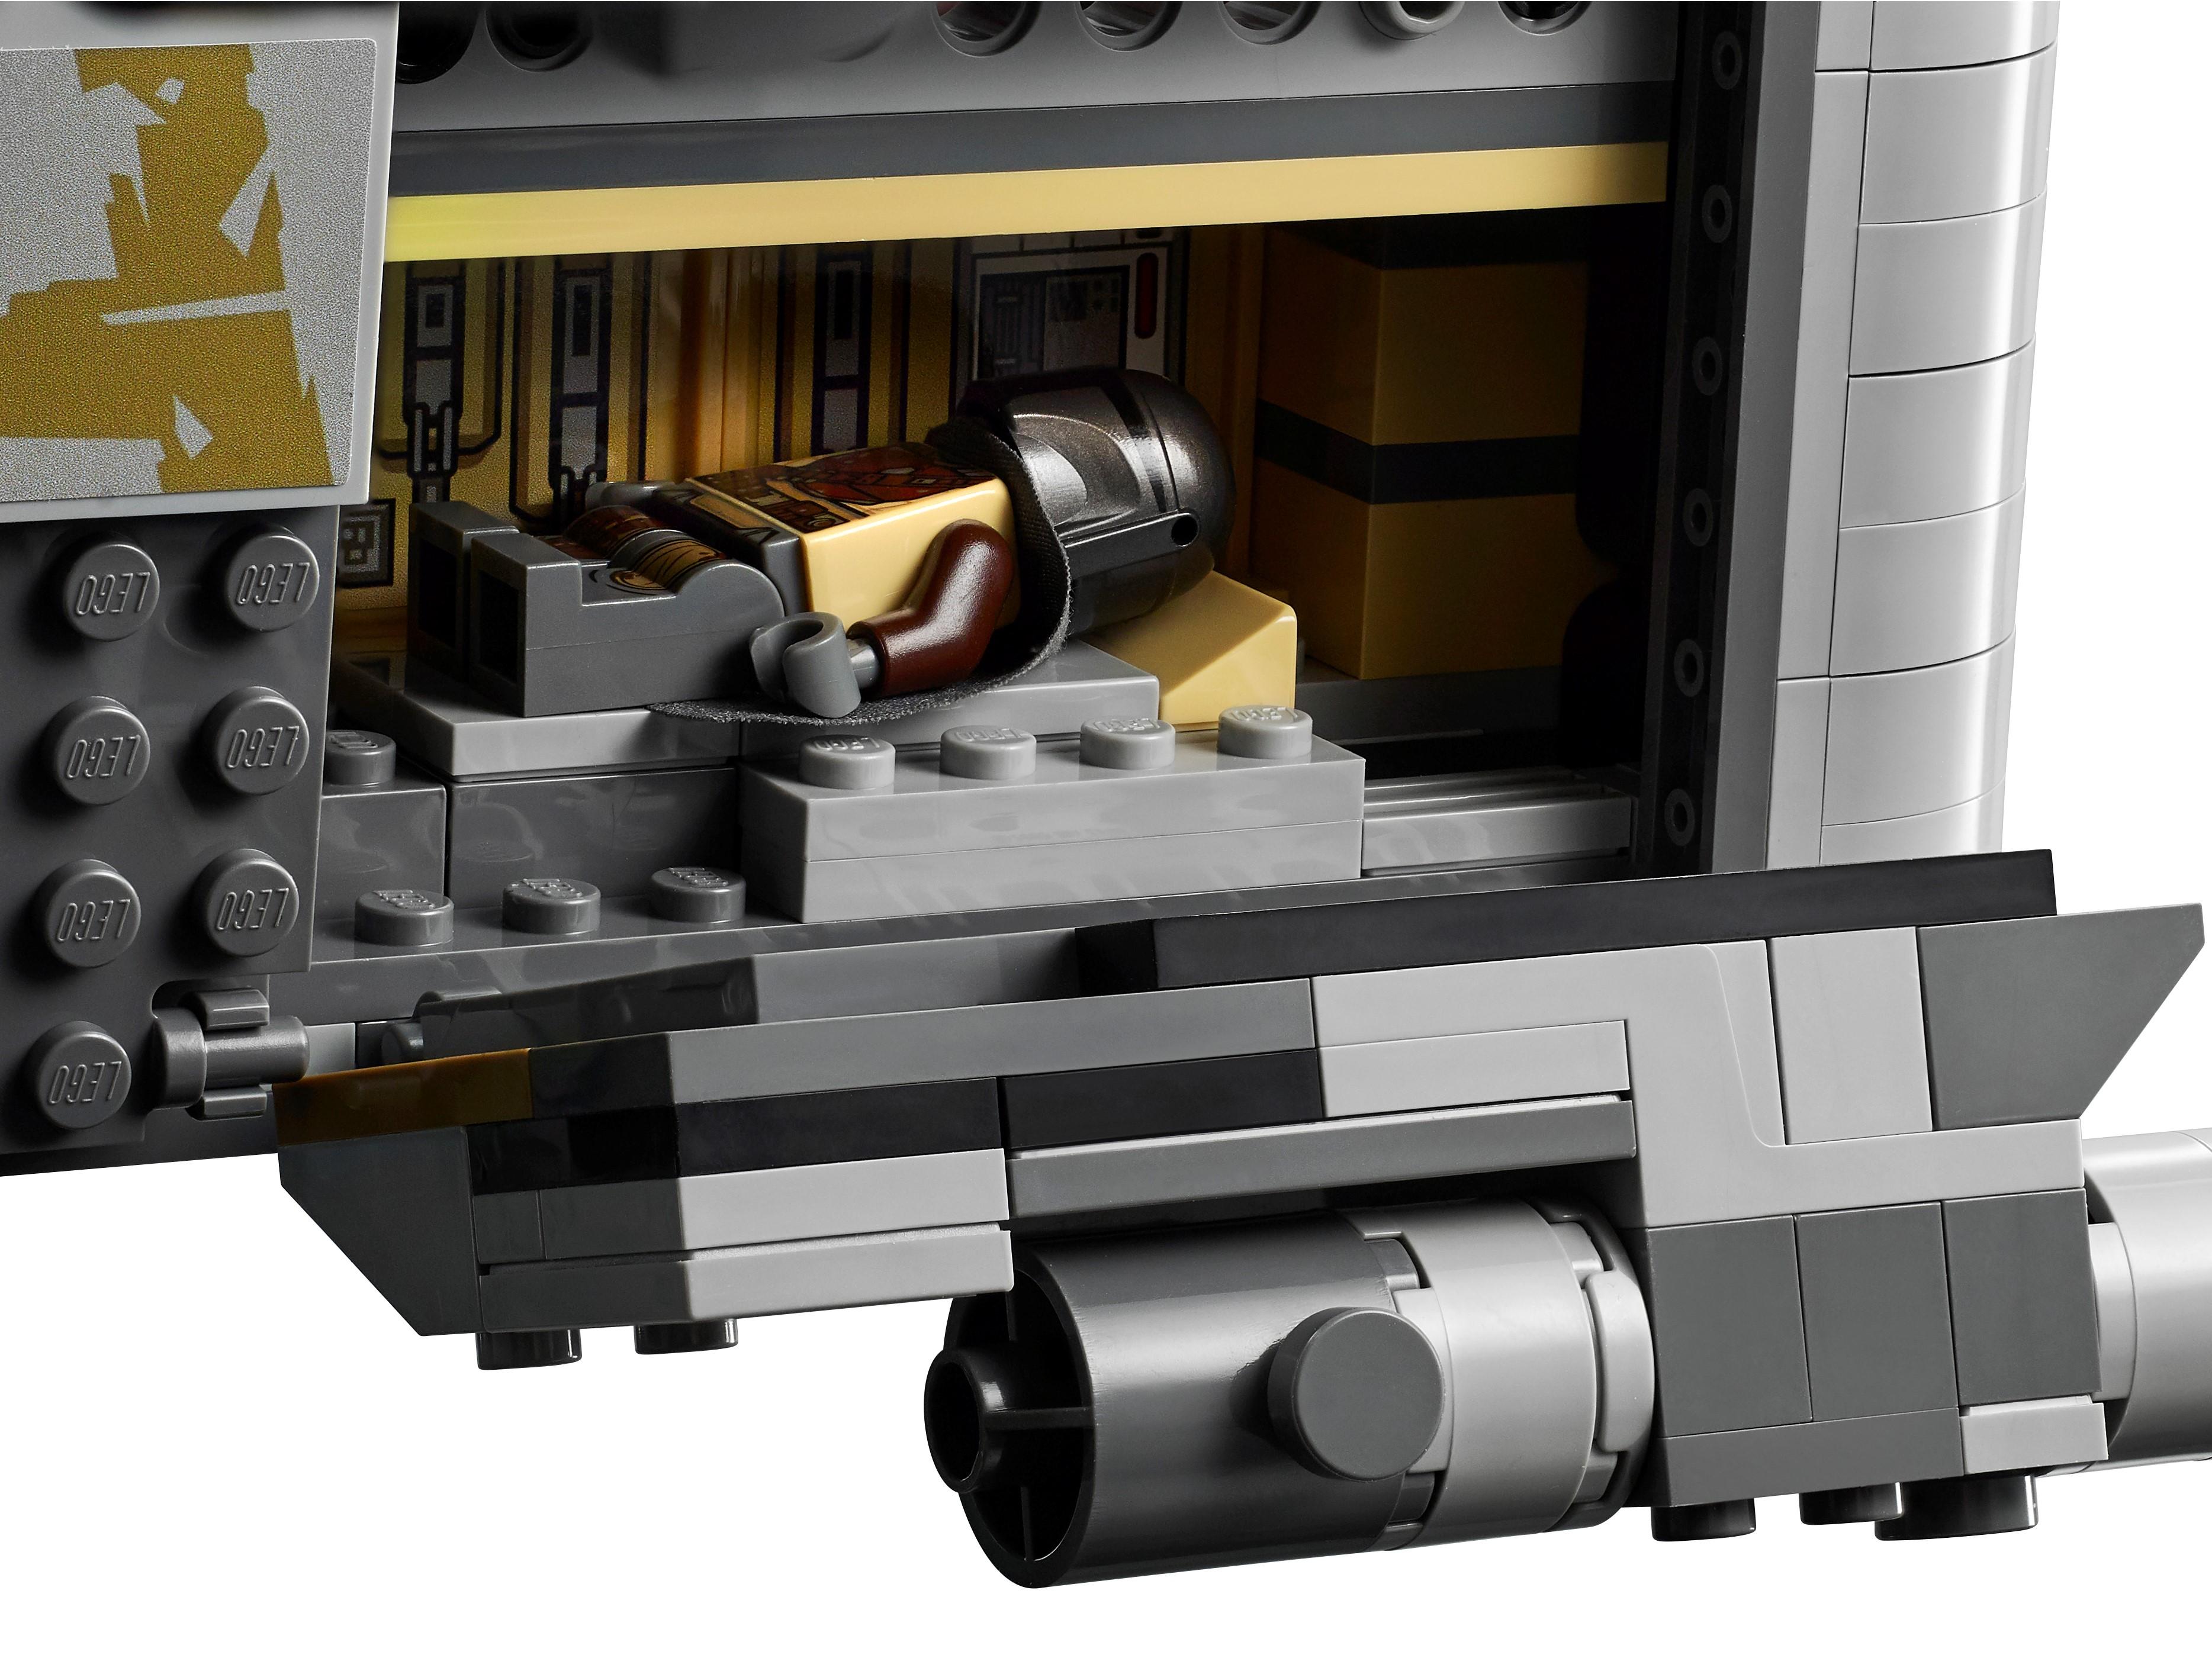 GENUINE LEGO STAR WARS BABY YODA MINIFIGURE THE CHILD 75292 MANDALORIAN RAZOR